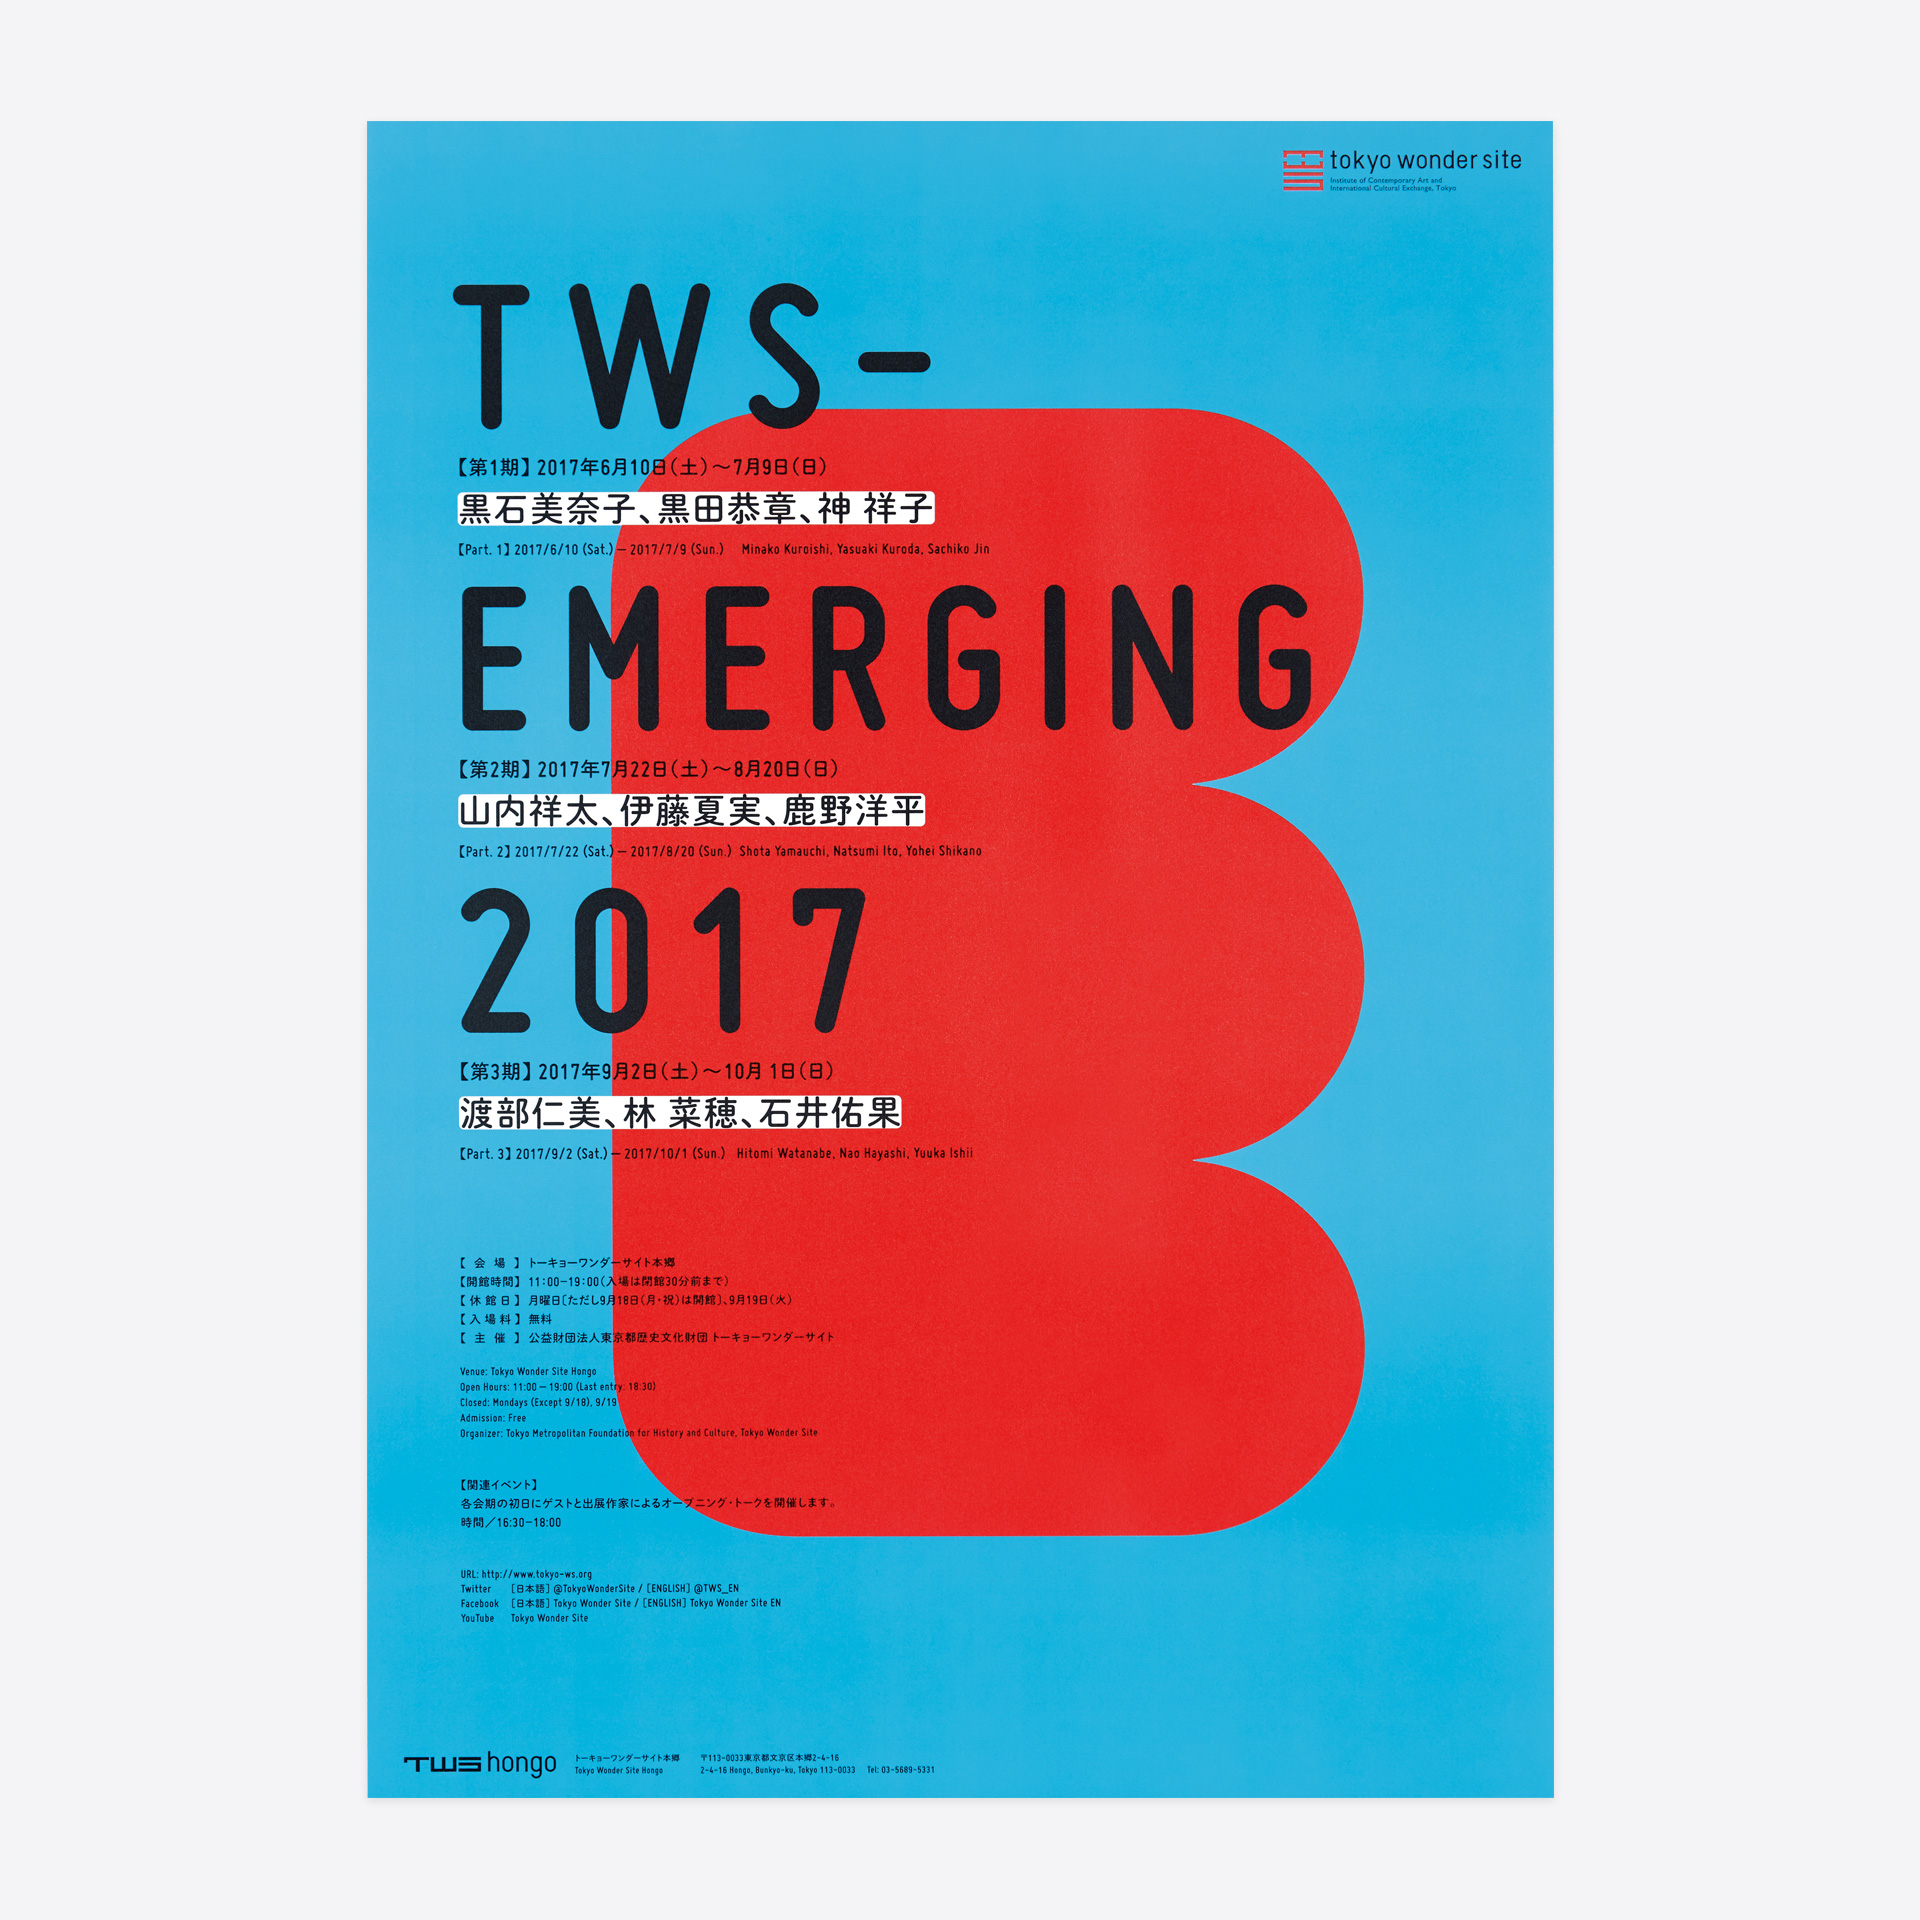 TWS-EMERGING 2017